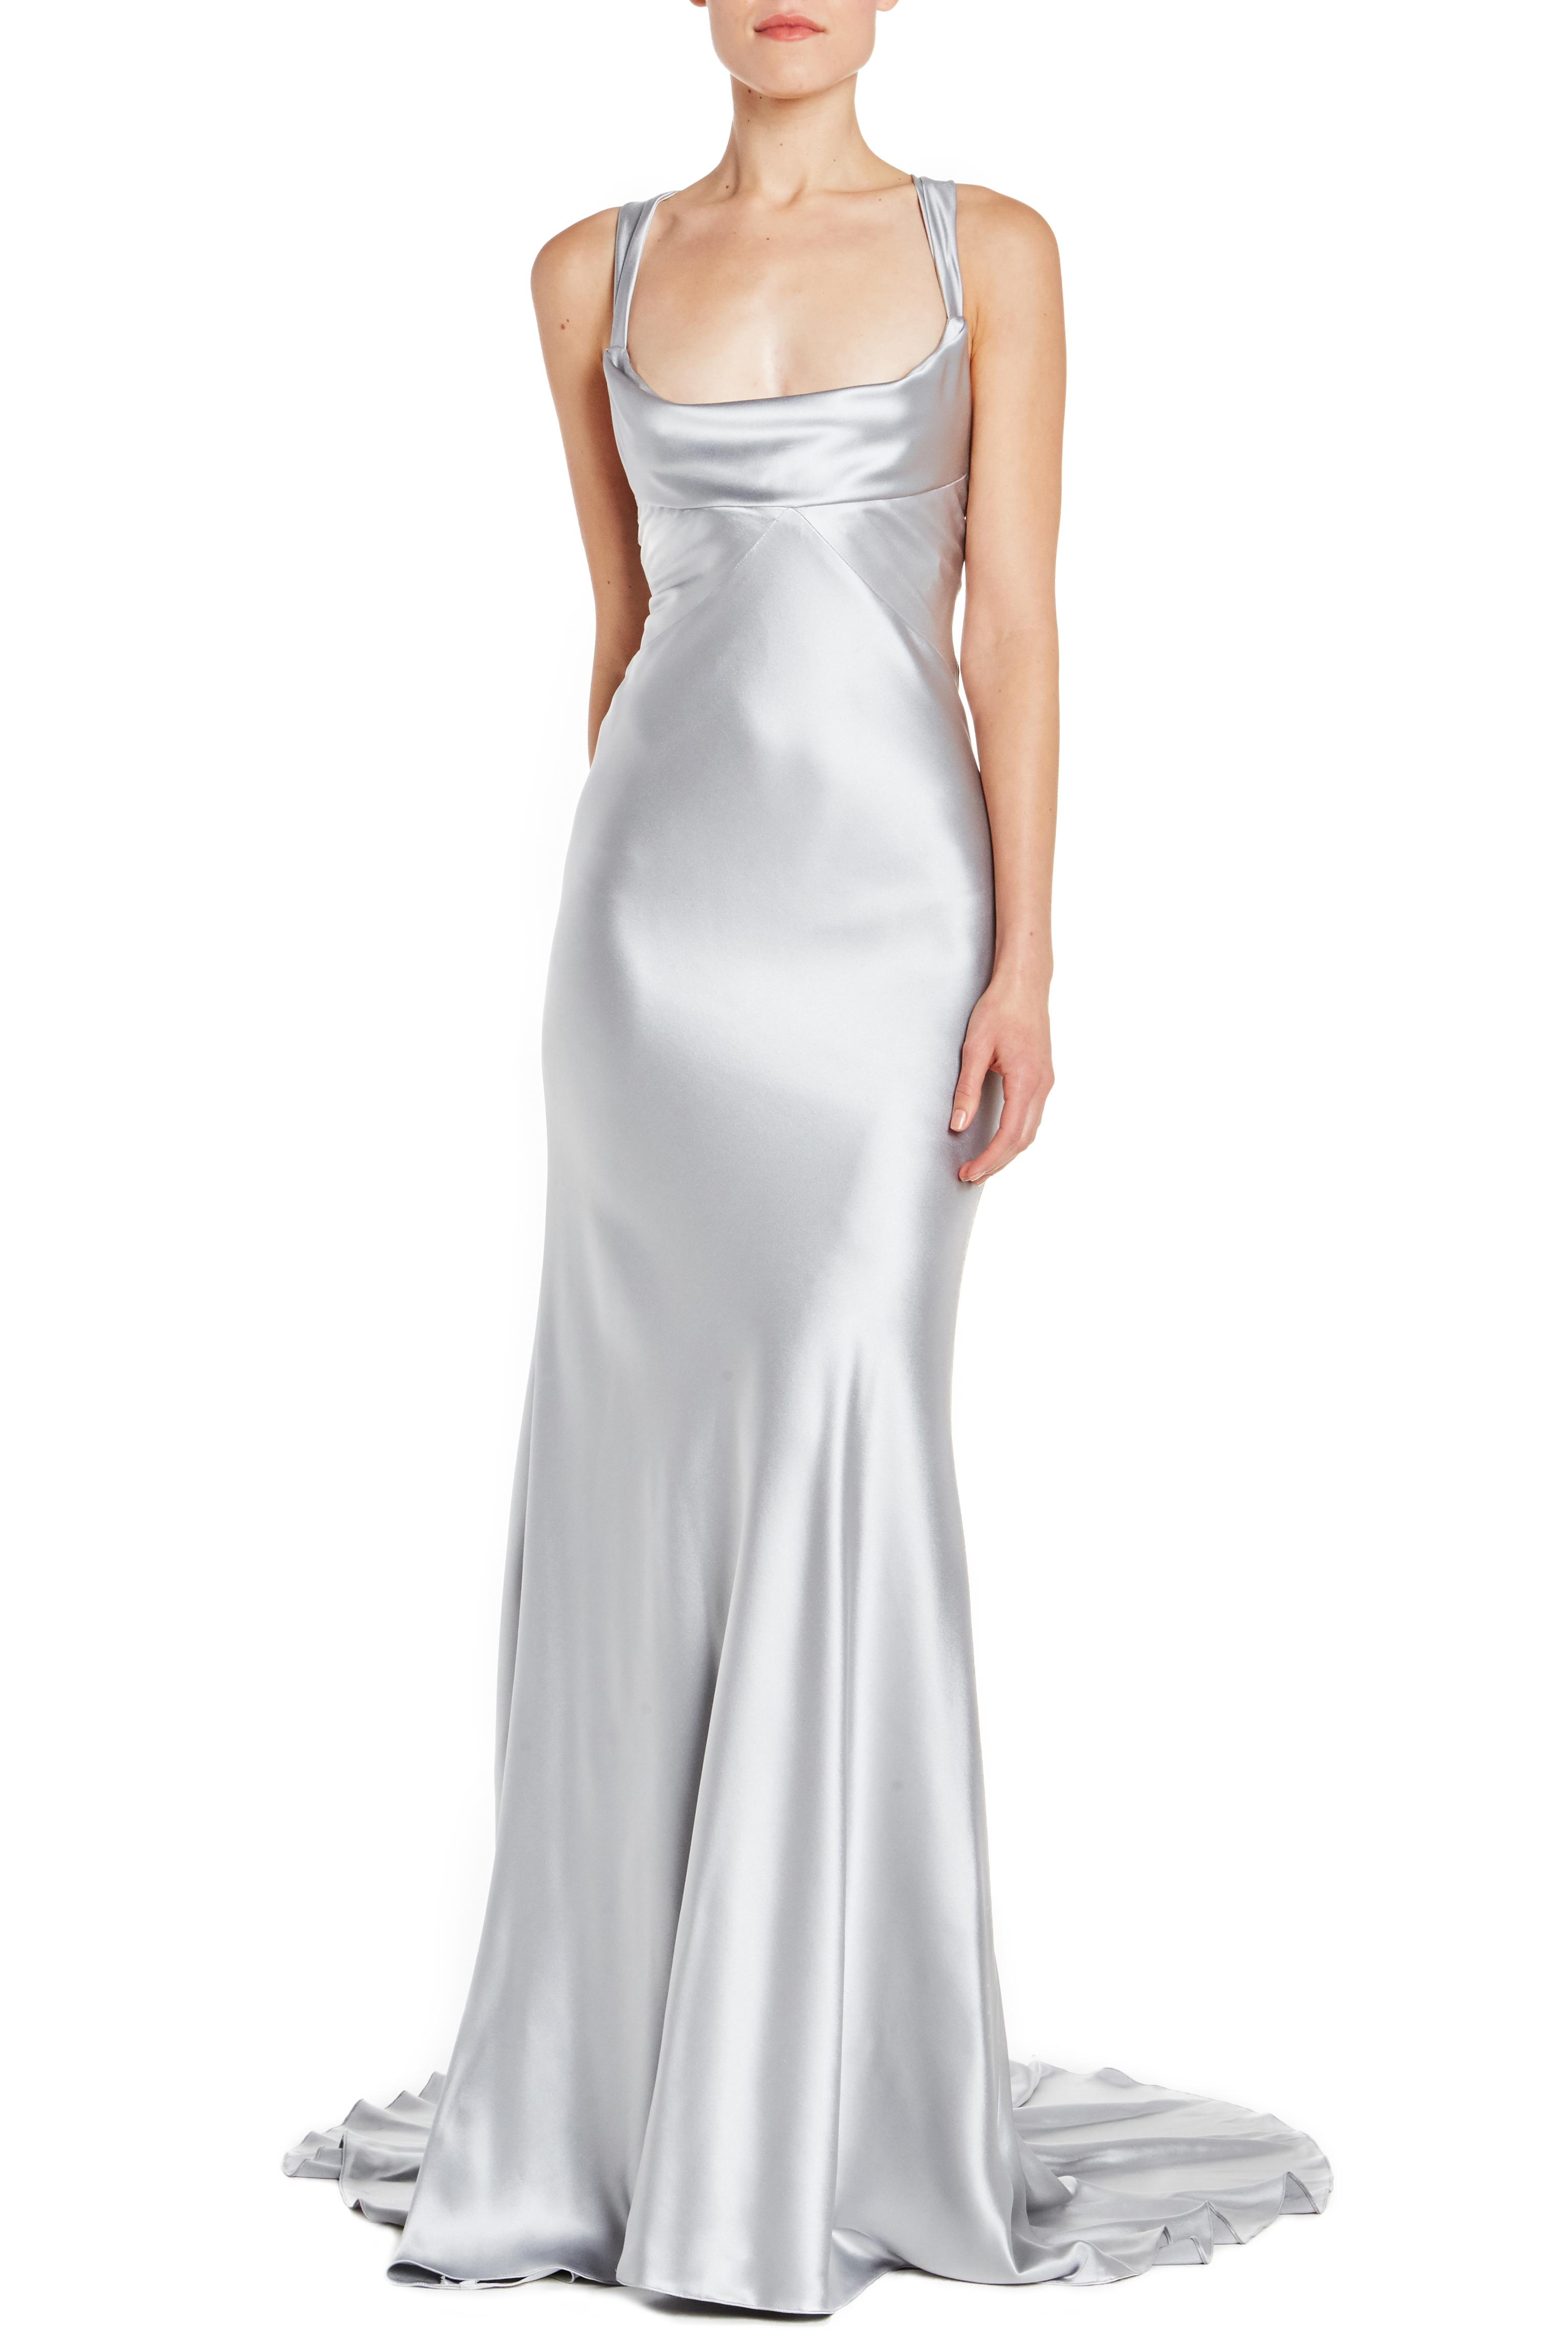 Monique Lhuillier Evening Gowns _Evening Dresses_dressesss